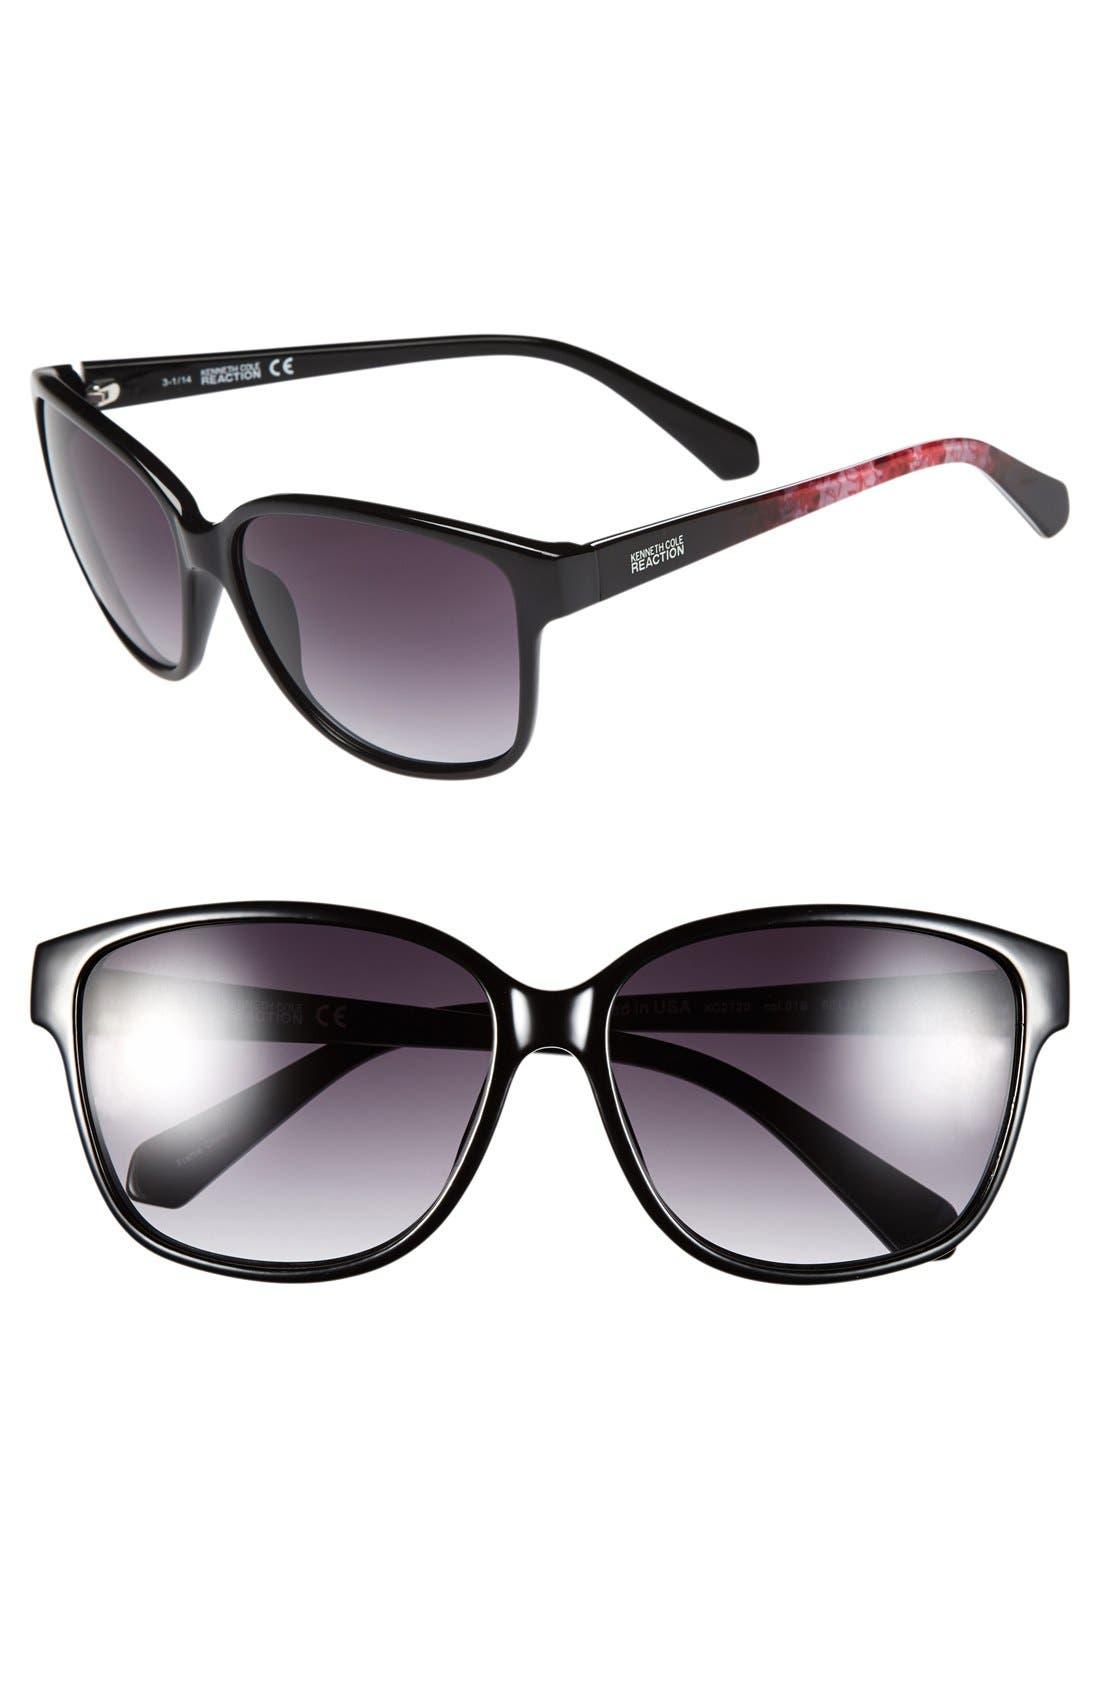 Main Image - Polaroid Eyewear 59mm Polarized Aviator Sunglasses